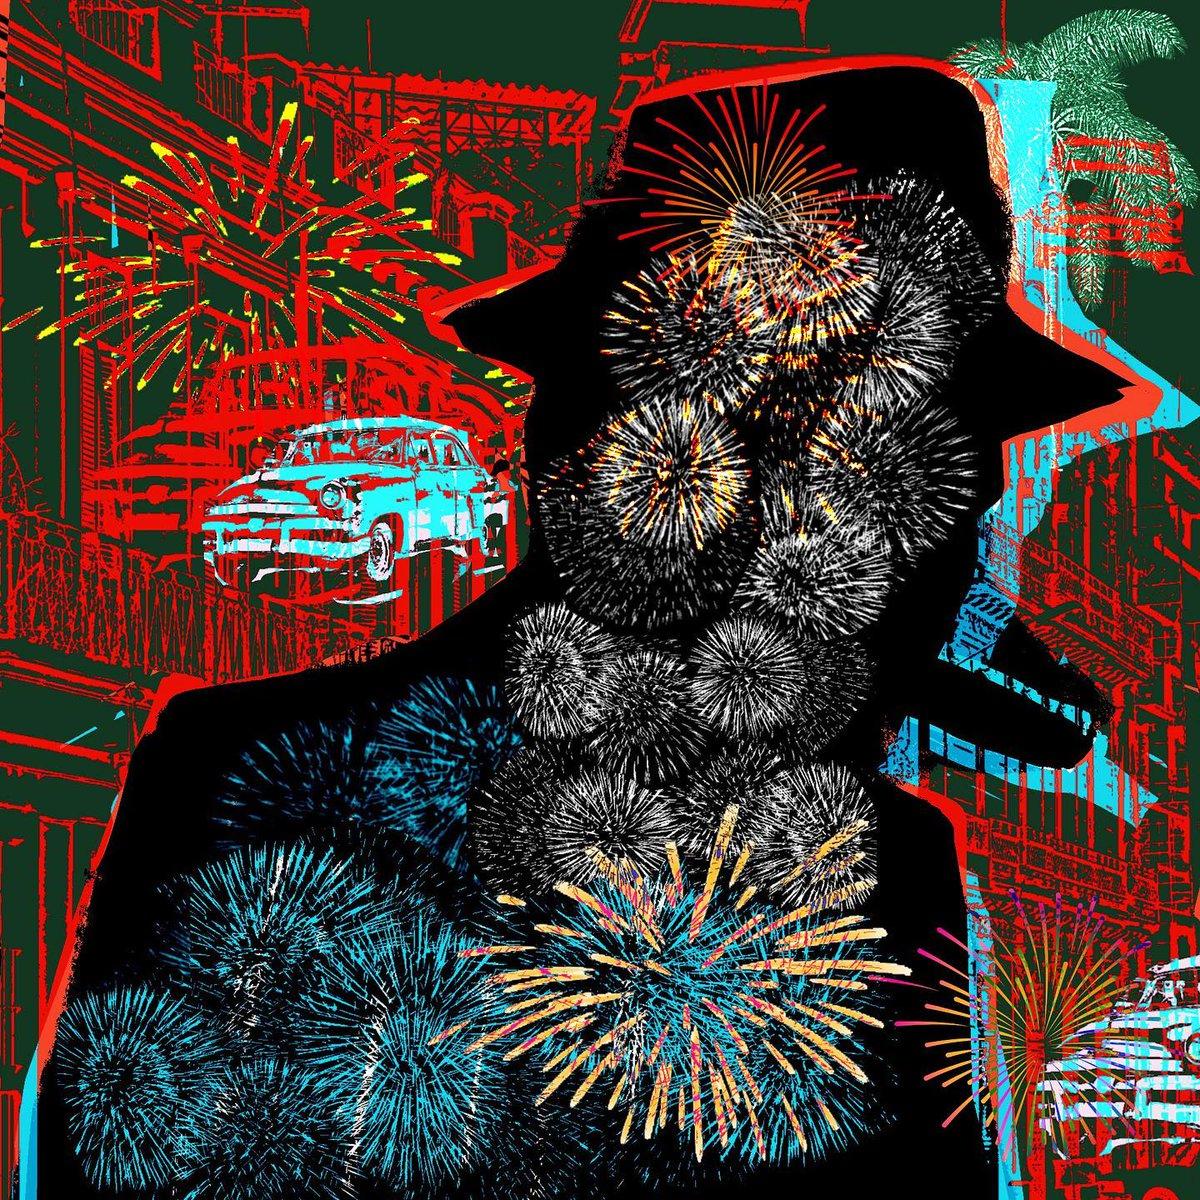 Check out this beautiful art inspired by Buena Vista Social Club and created by @NgadiSmart . Share your own Buena Vista Social Club inspired artwork using #BVSC25Art  #artwork #artist #artoftheday #buenavistasocialclub